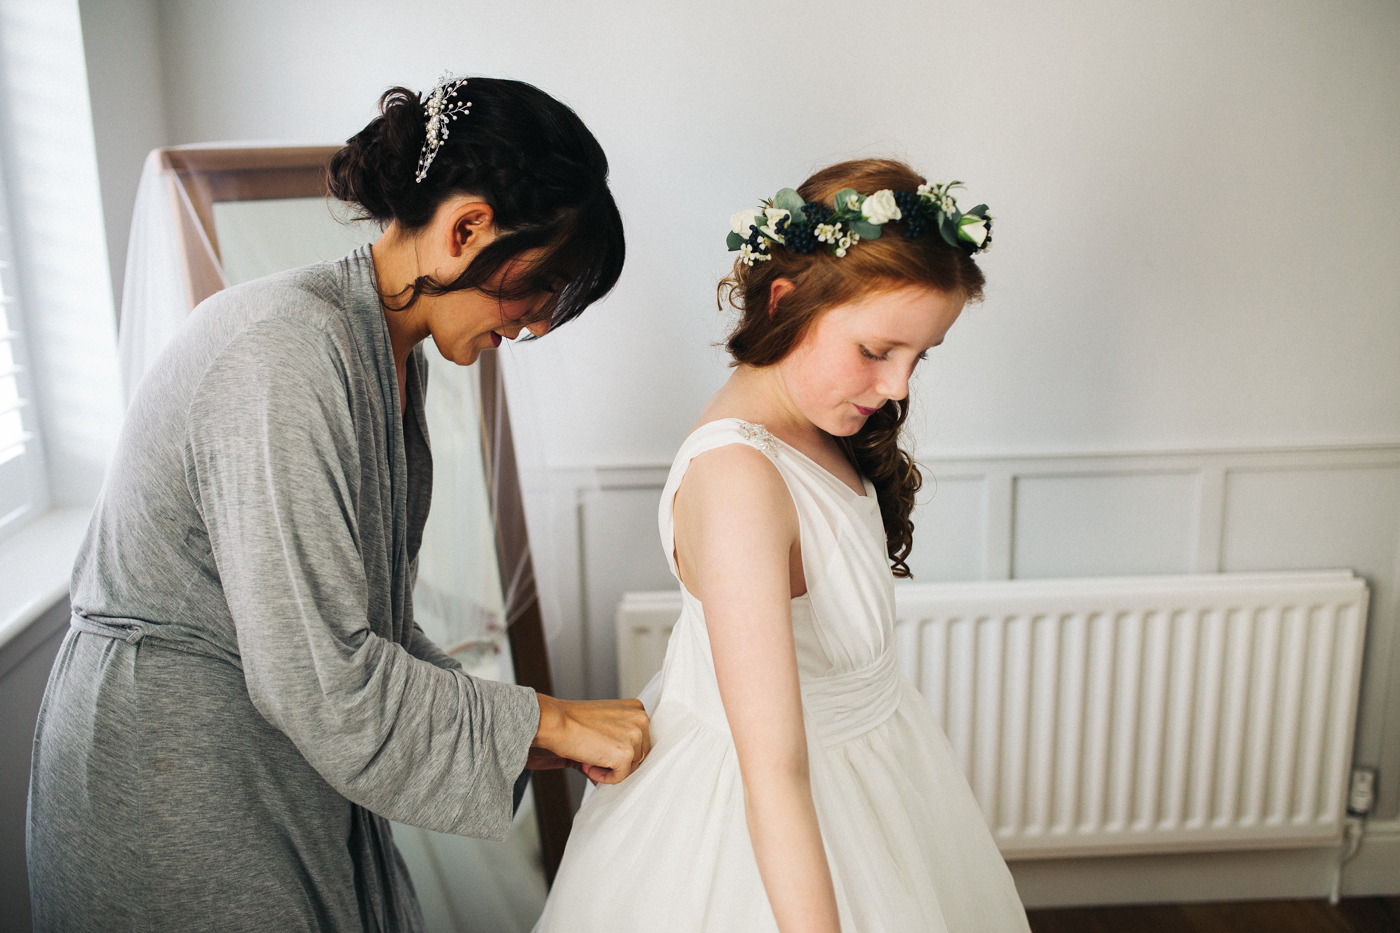 york-house-malton-wedding-photographer-north-yorkshire-0006.jpg